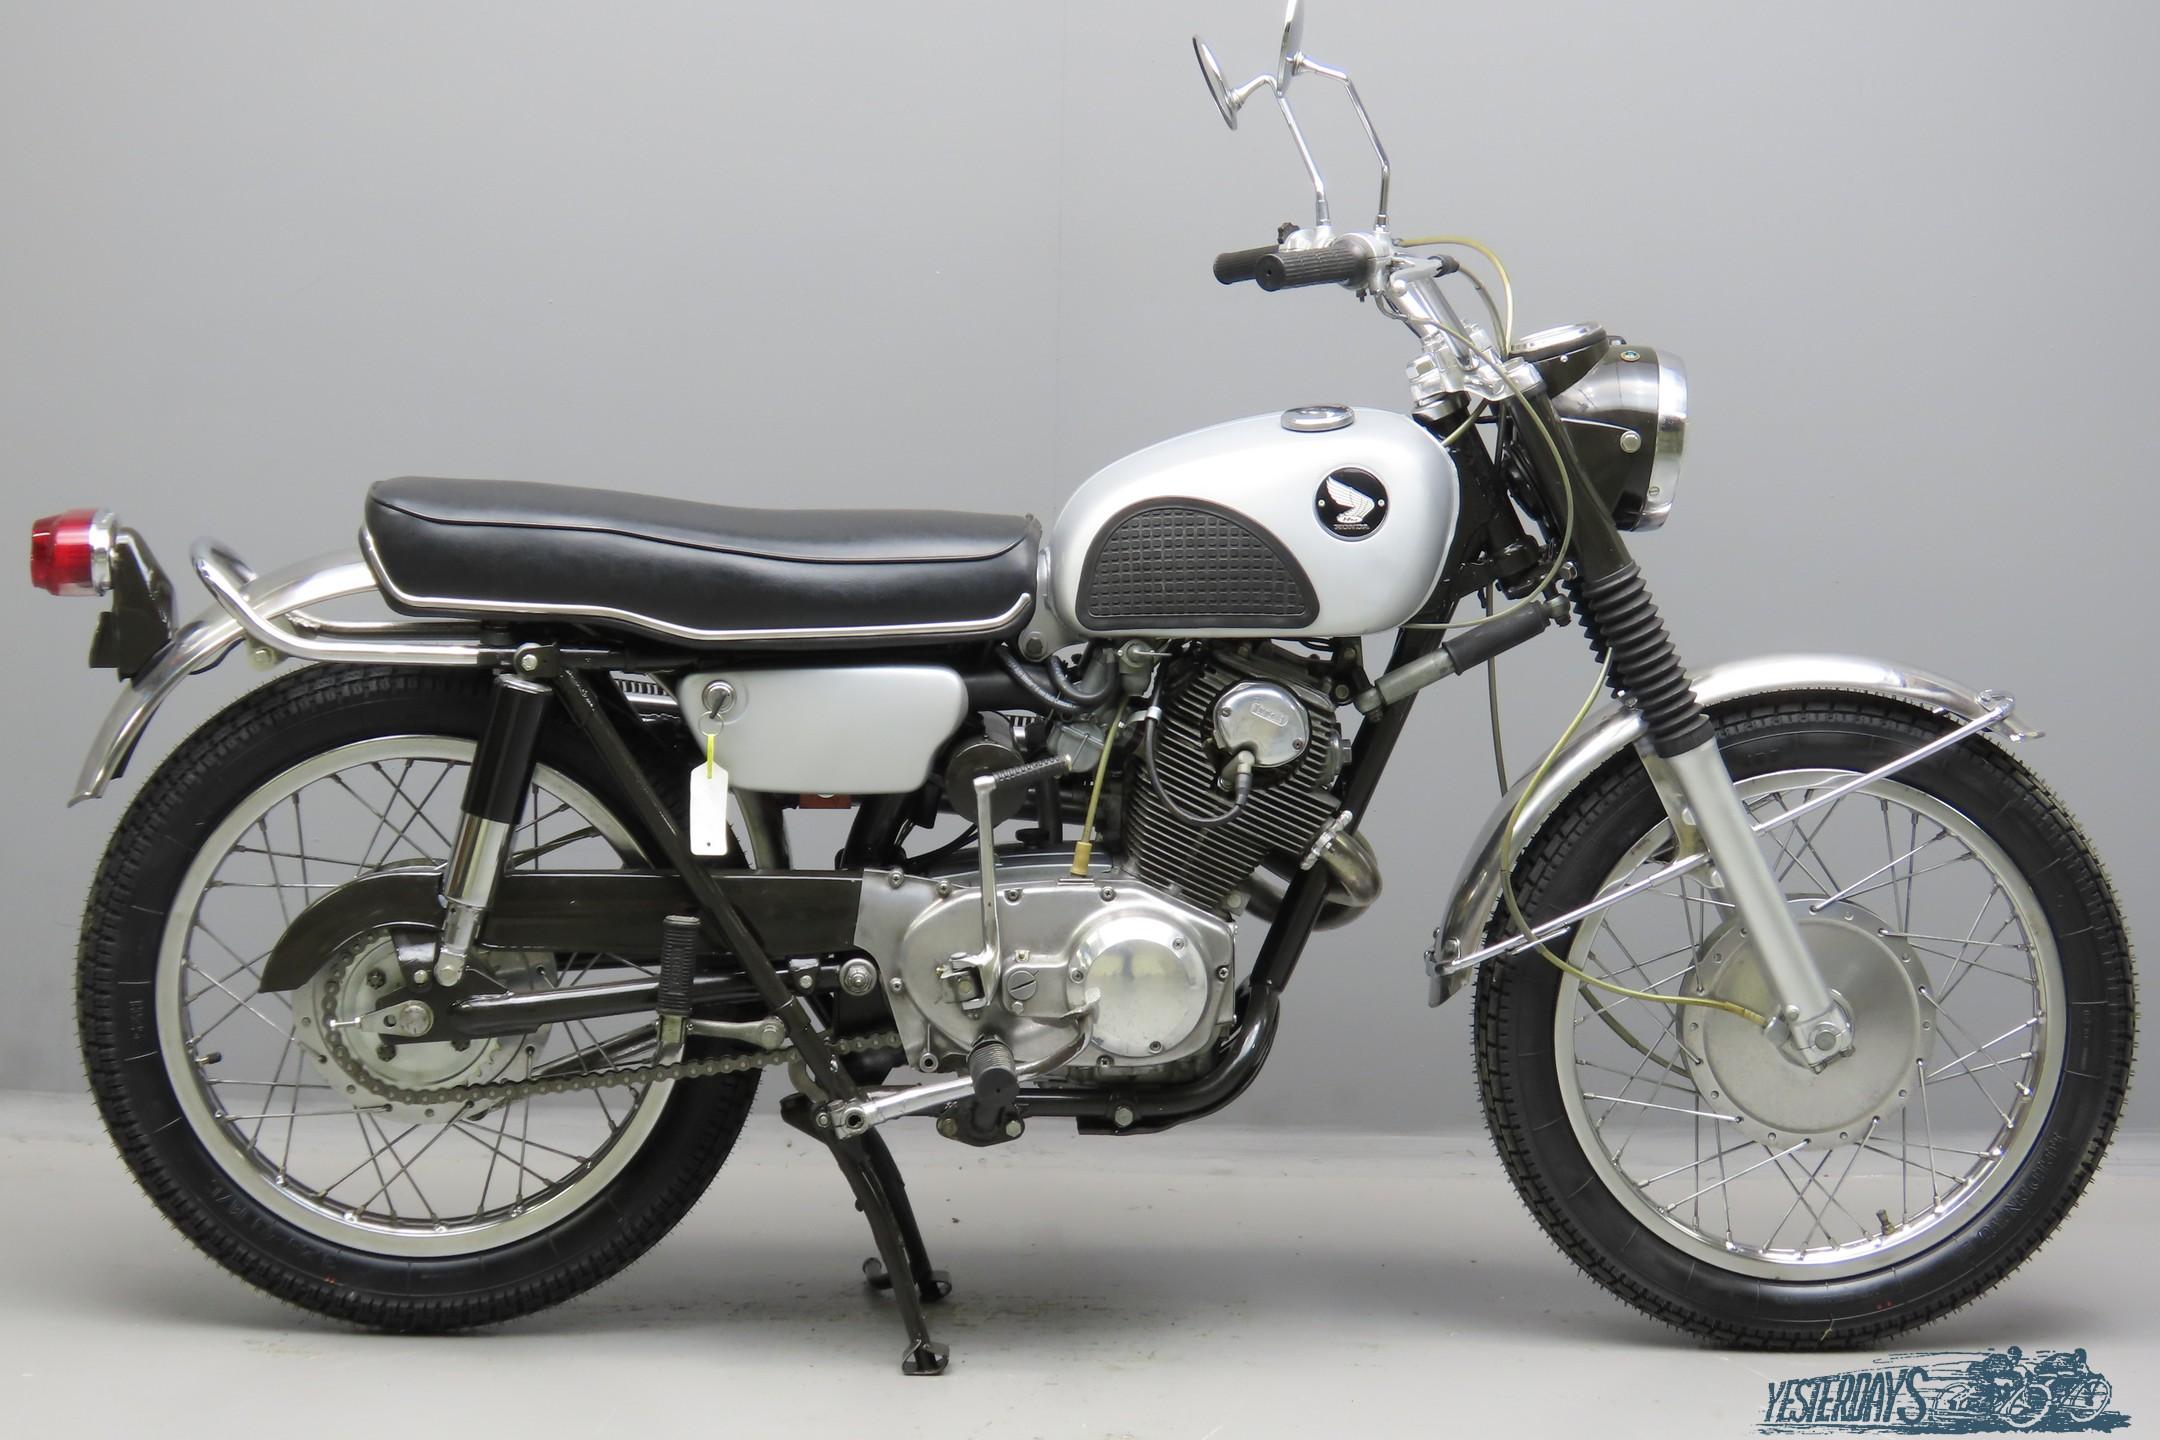 Honda 1965 CL 77  305cc 2 cyl ohc  3009